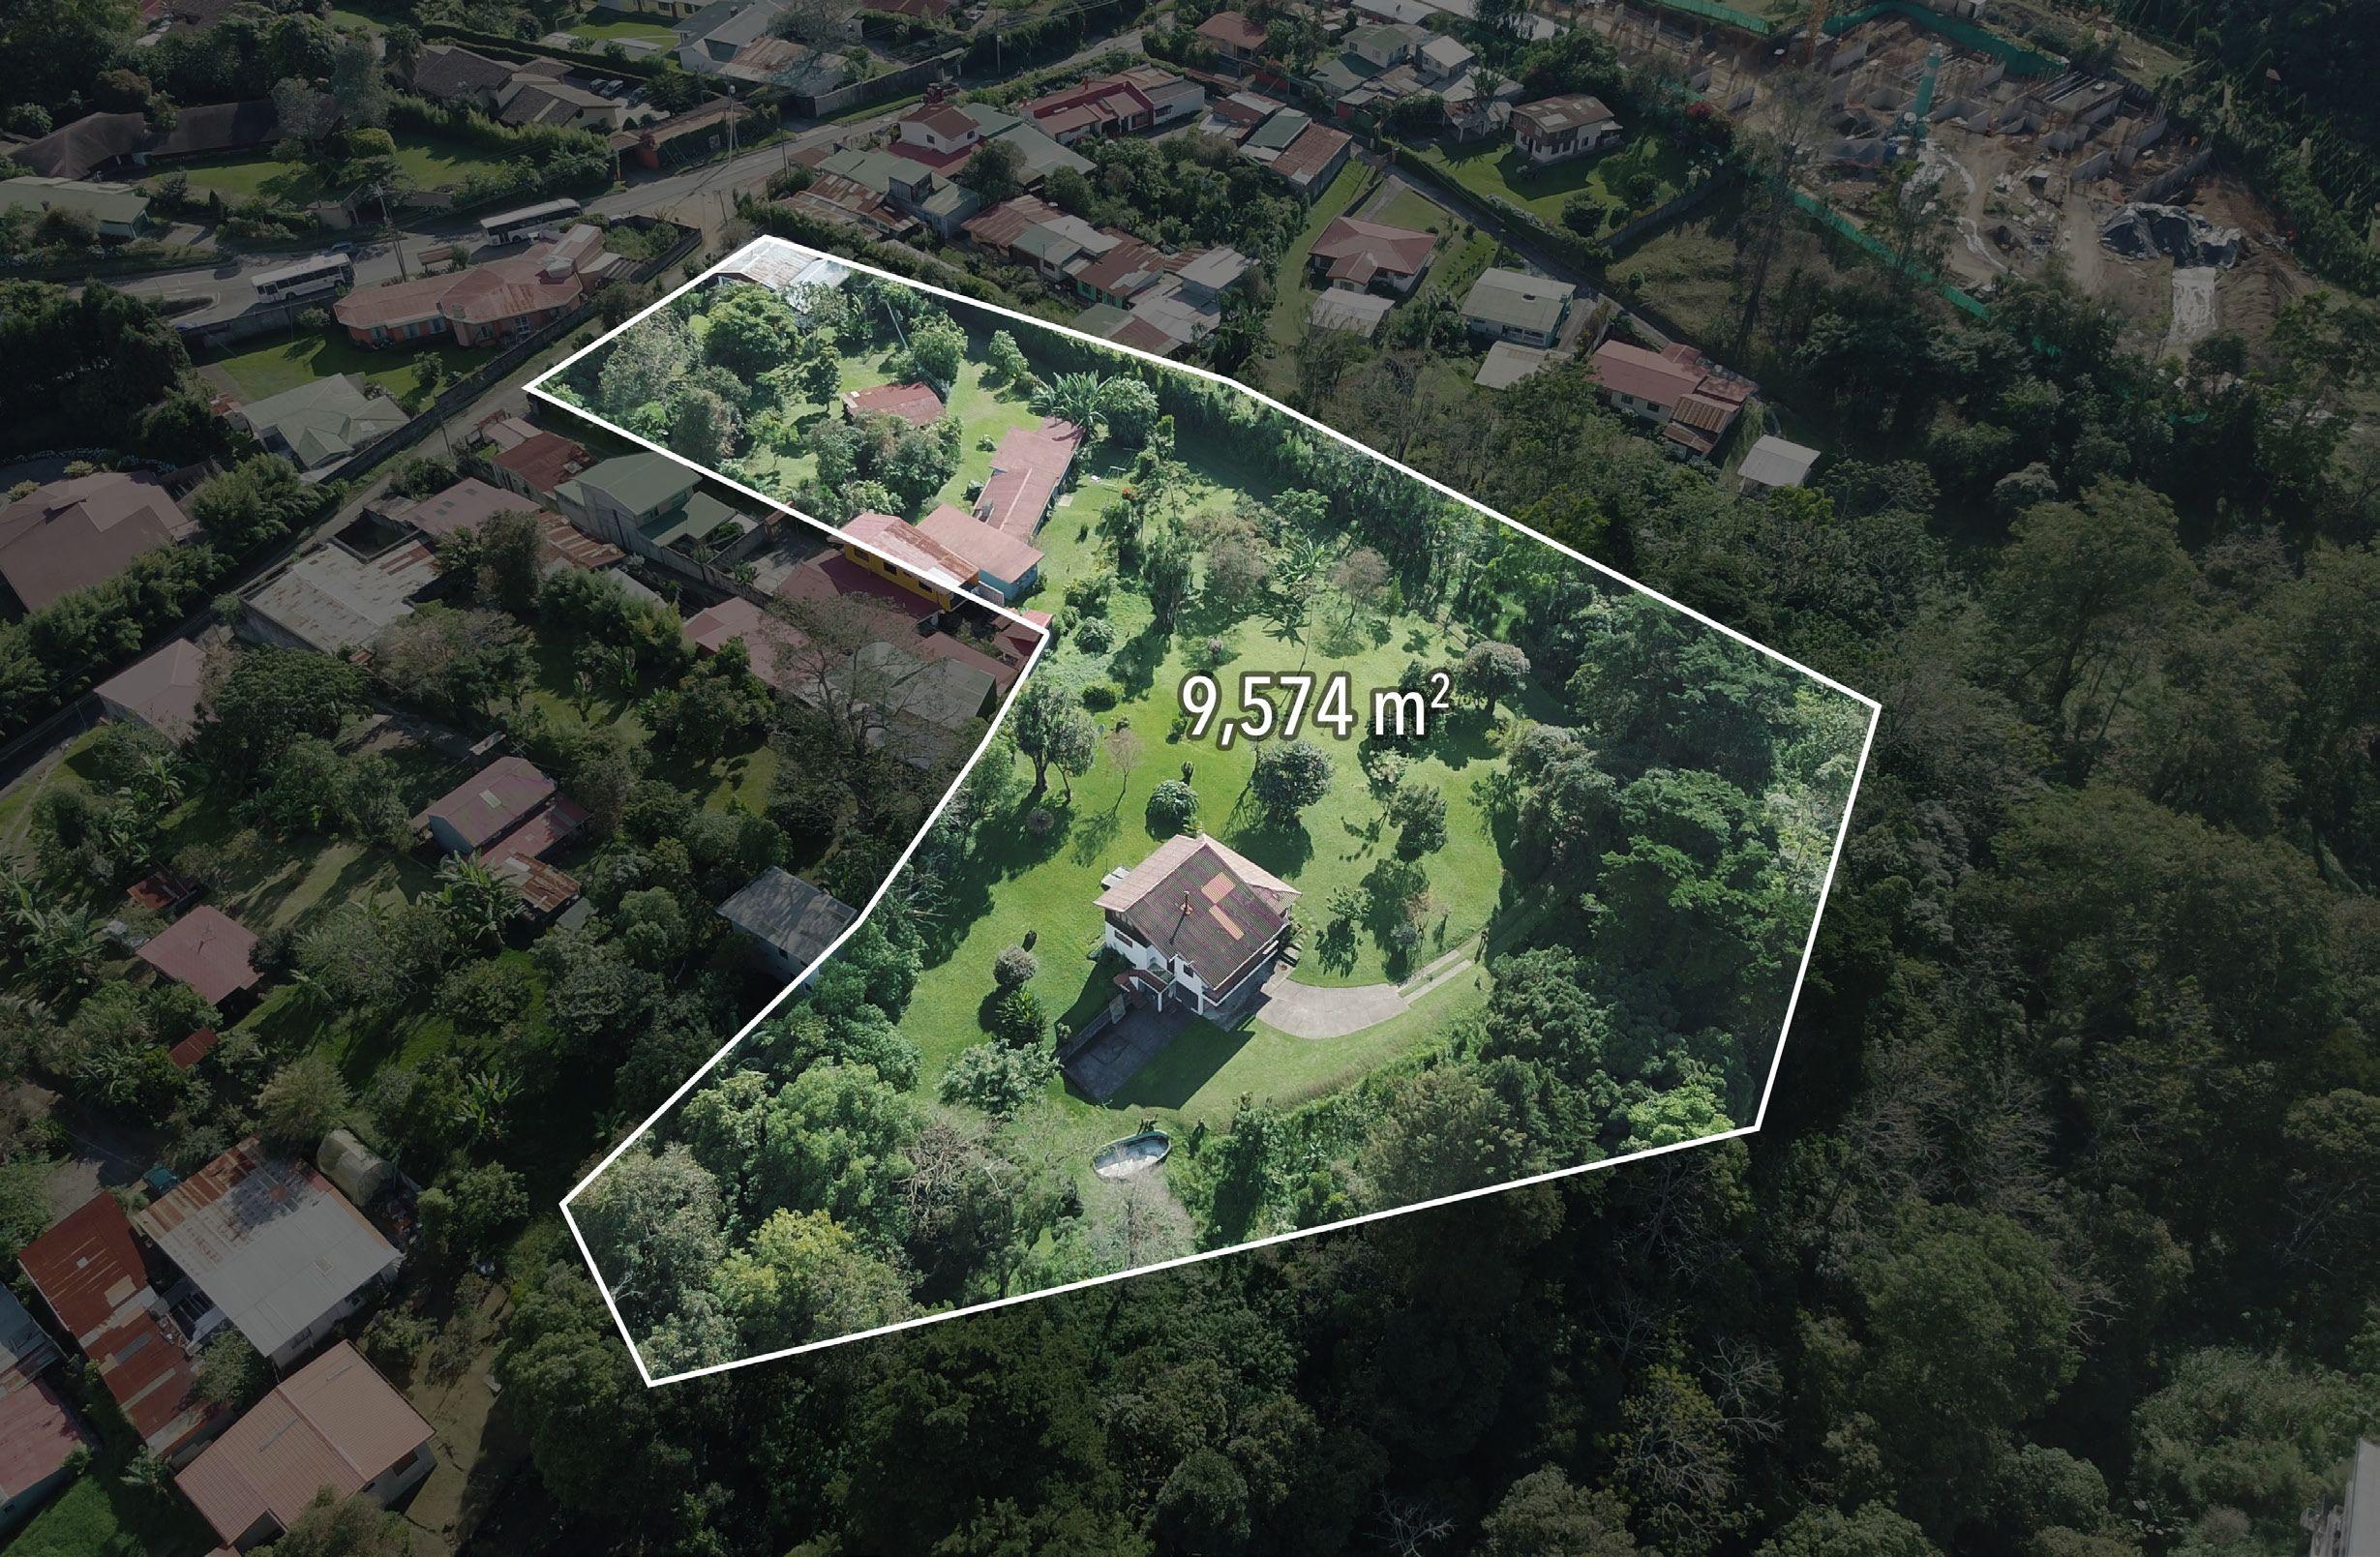 2.5-Acre Property for Sale, Ideal for Condo Development, San Rafael, Montes de Oca